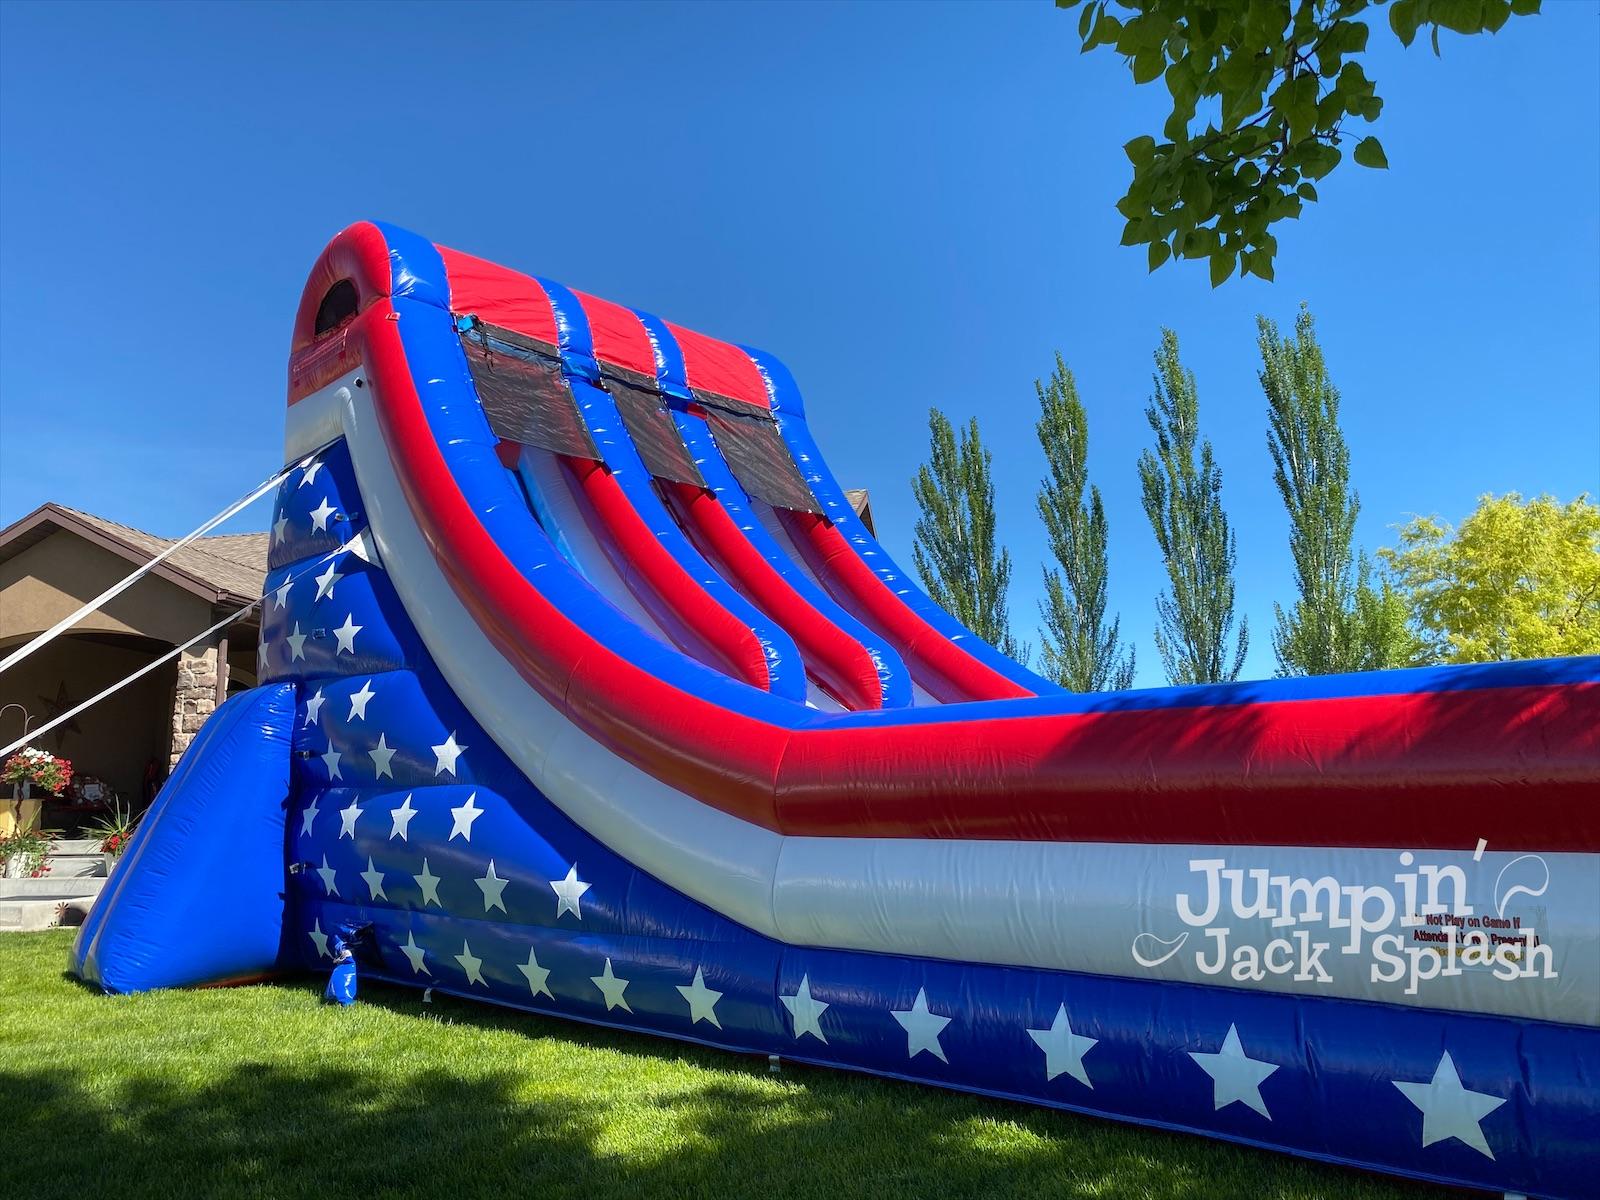 Jumpin Jack Splash 18ft Double Lane Water Slide. All American Water Slide